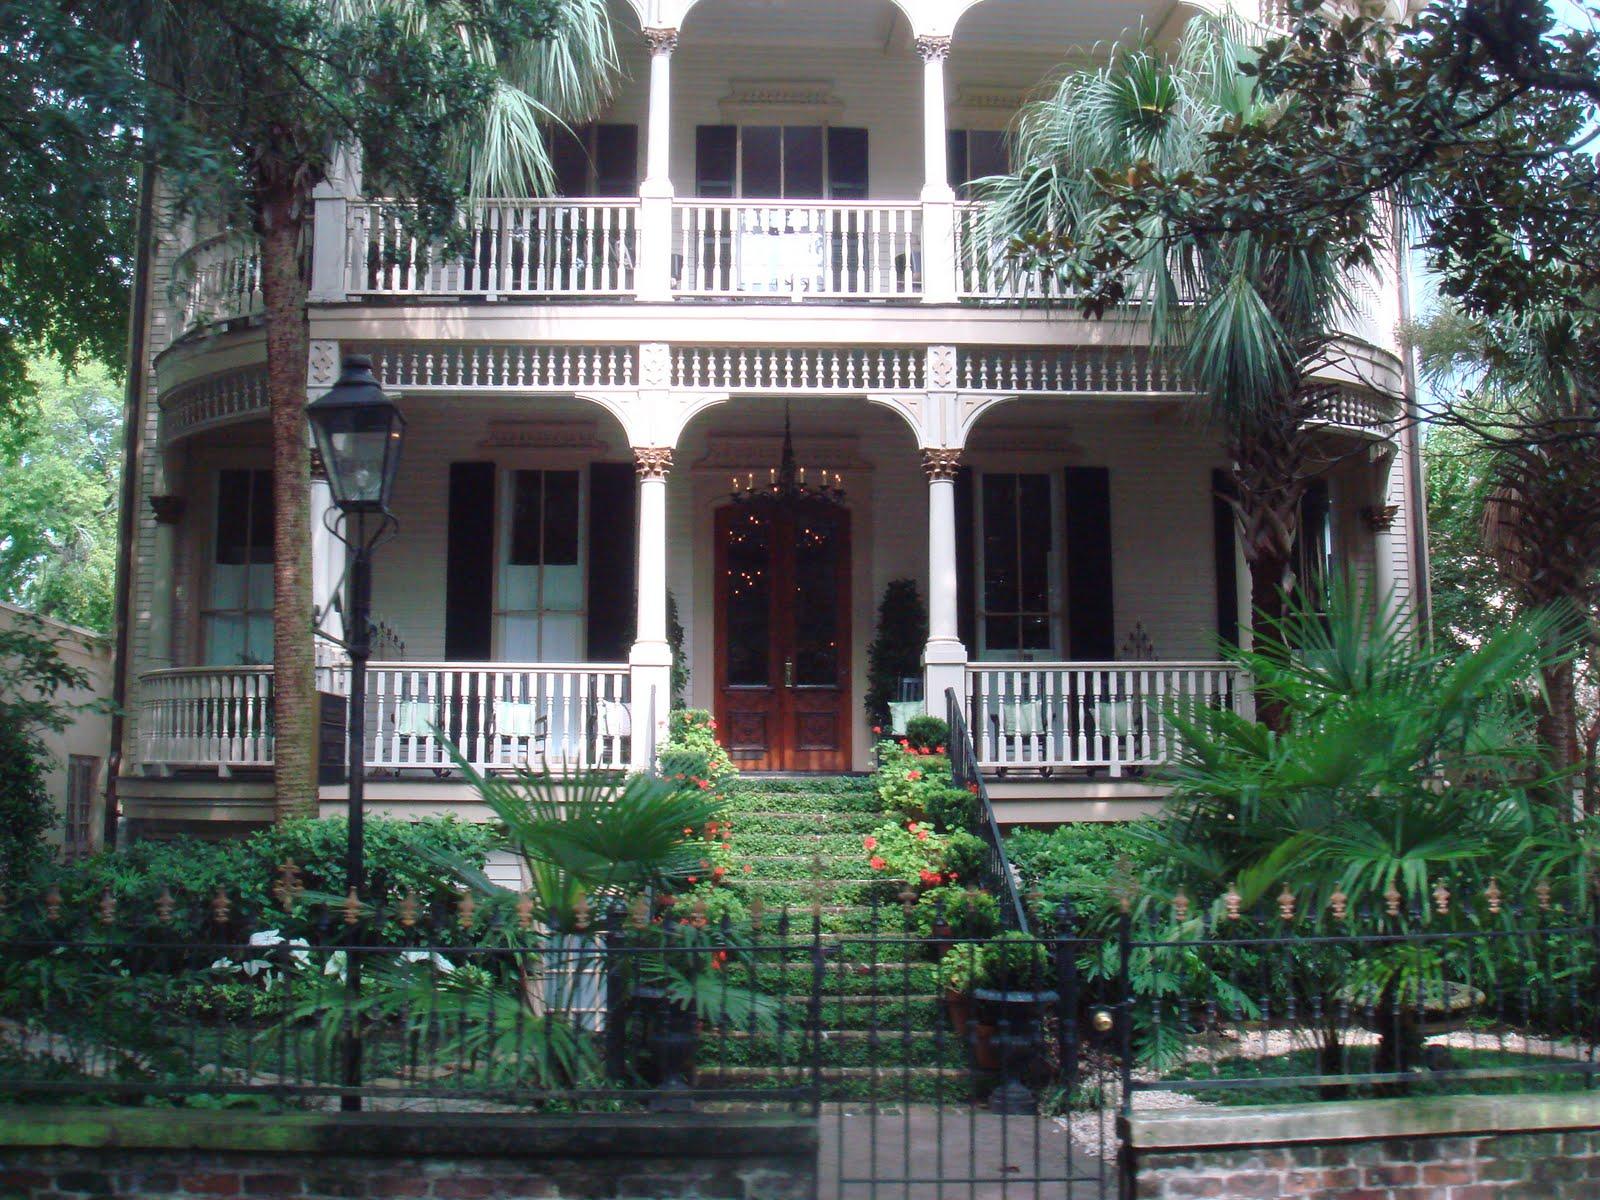 Holly burda bp 14 iar 221 for Historic houses in savannah ga